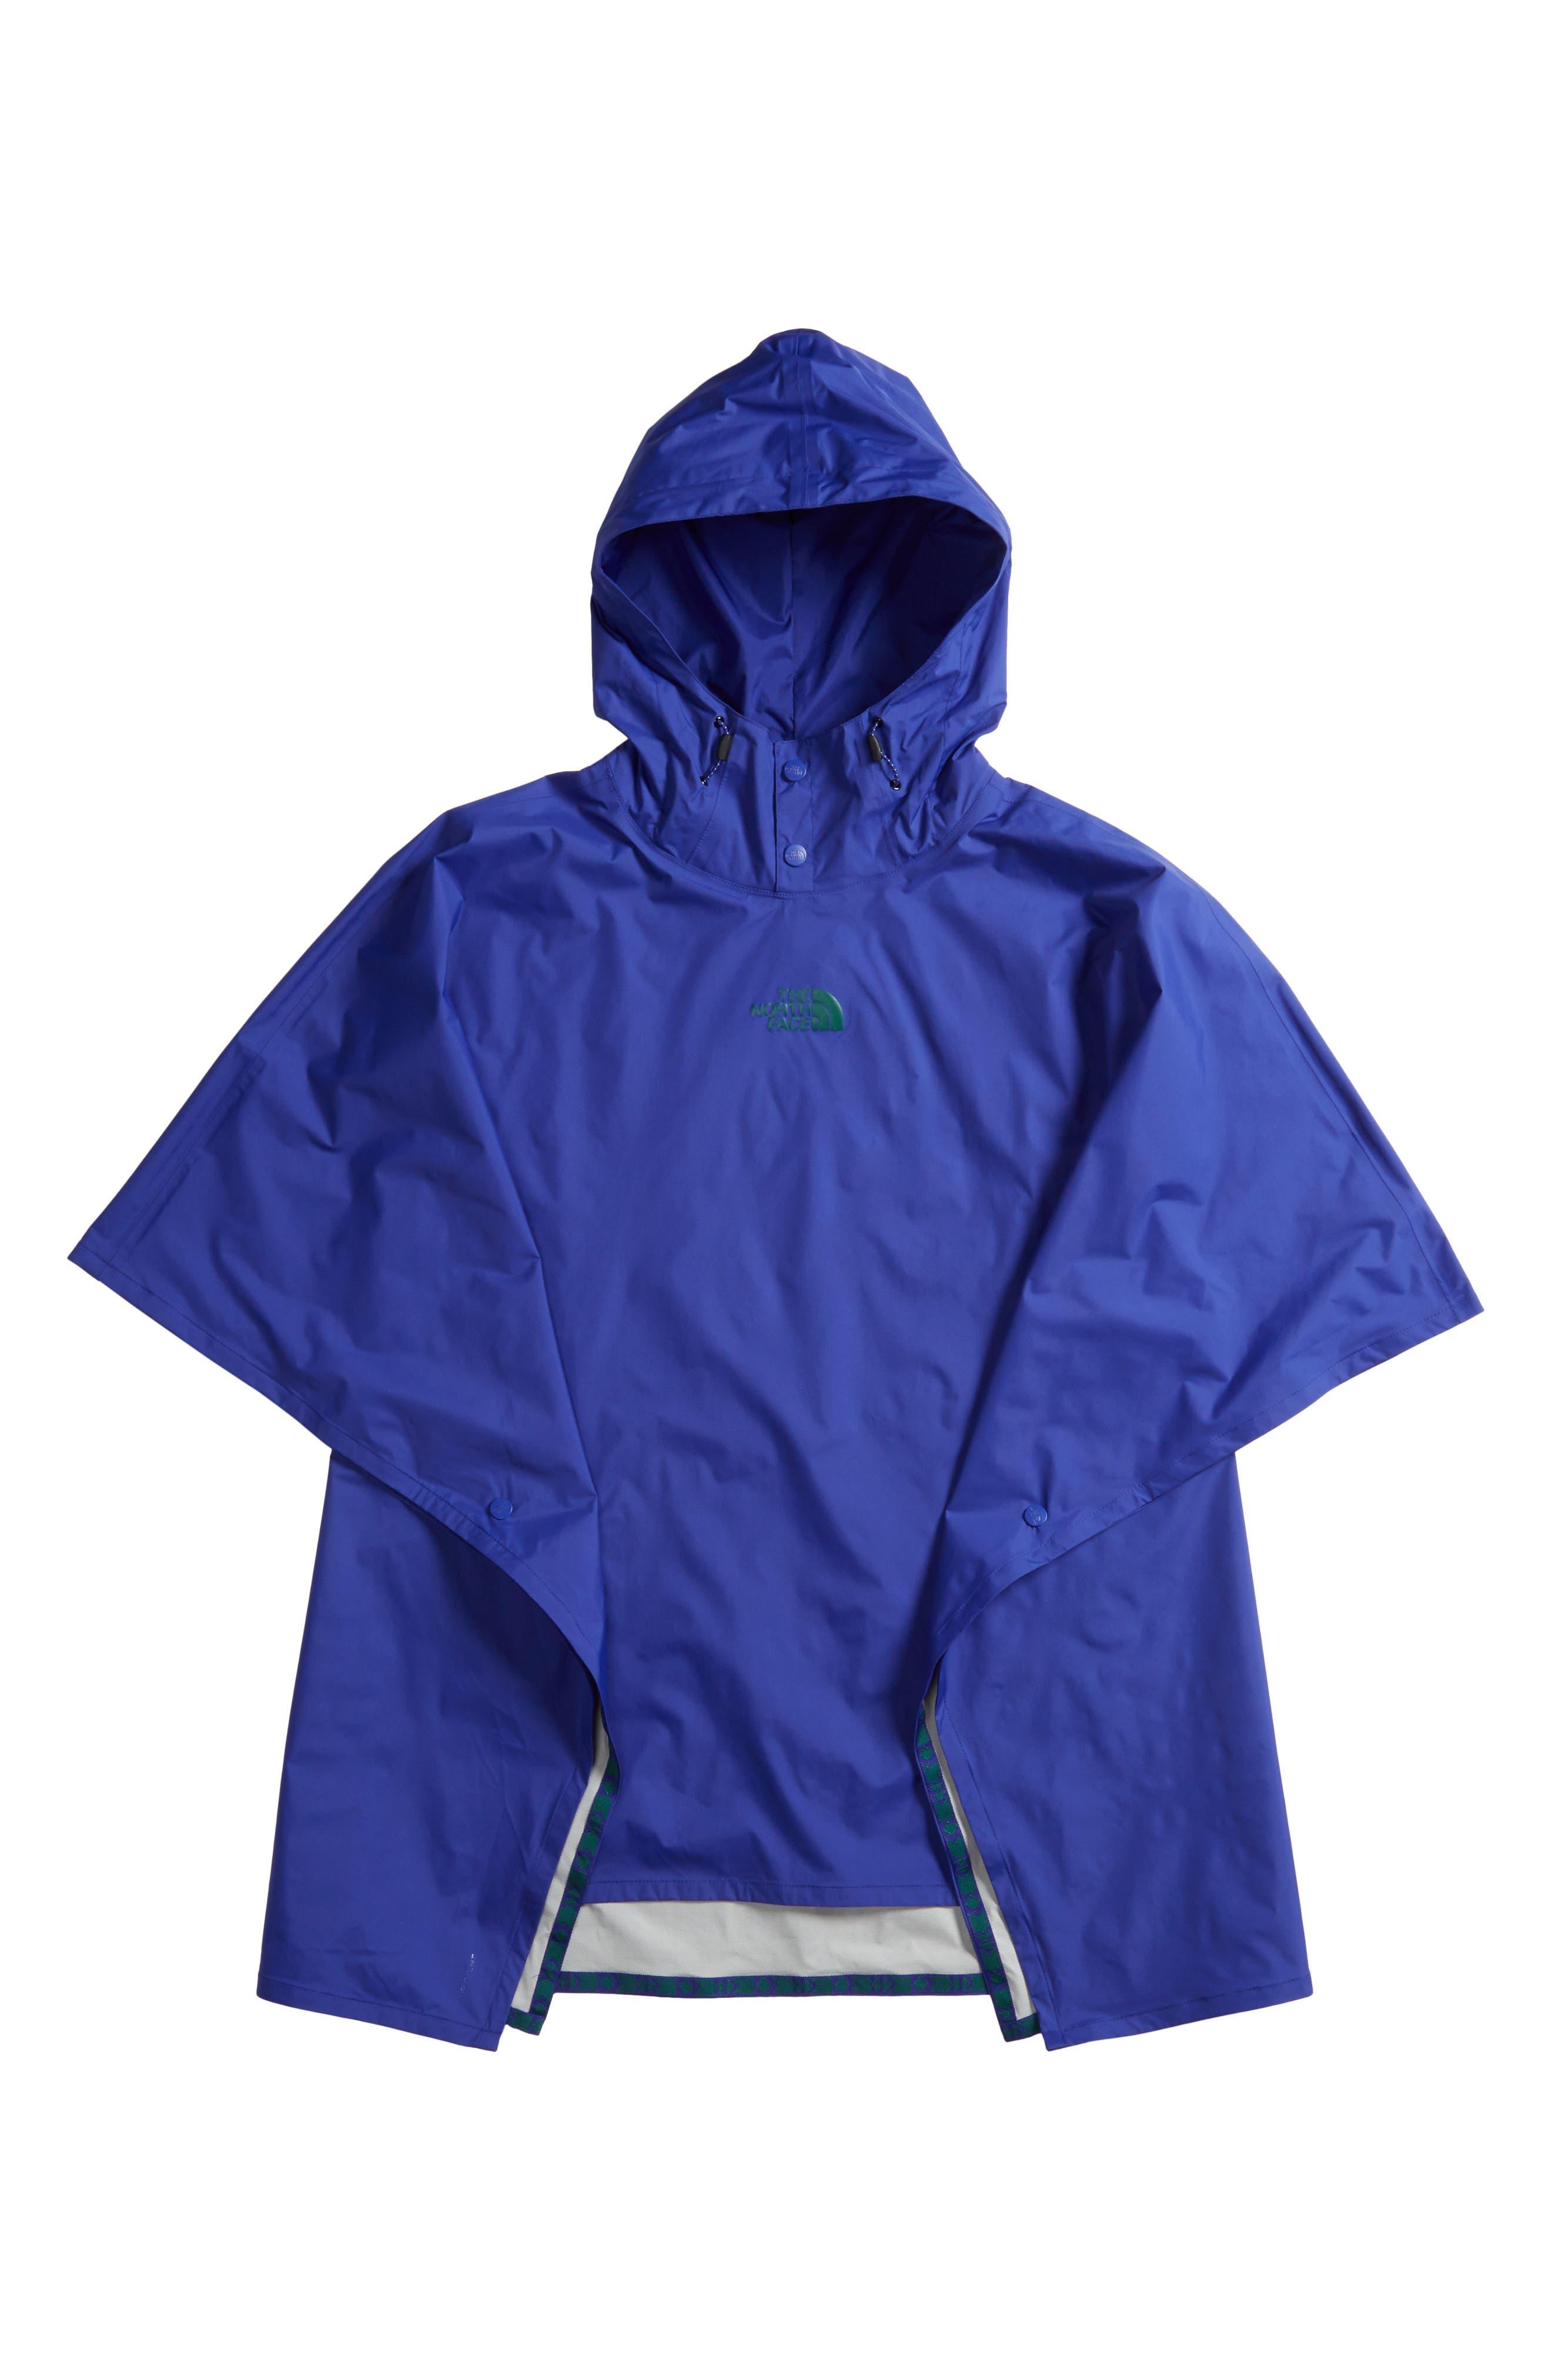 Unisex Rain Poncho,                             Main thumbnail 1, color,                             Lapis Blue